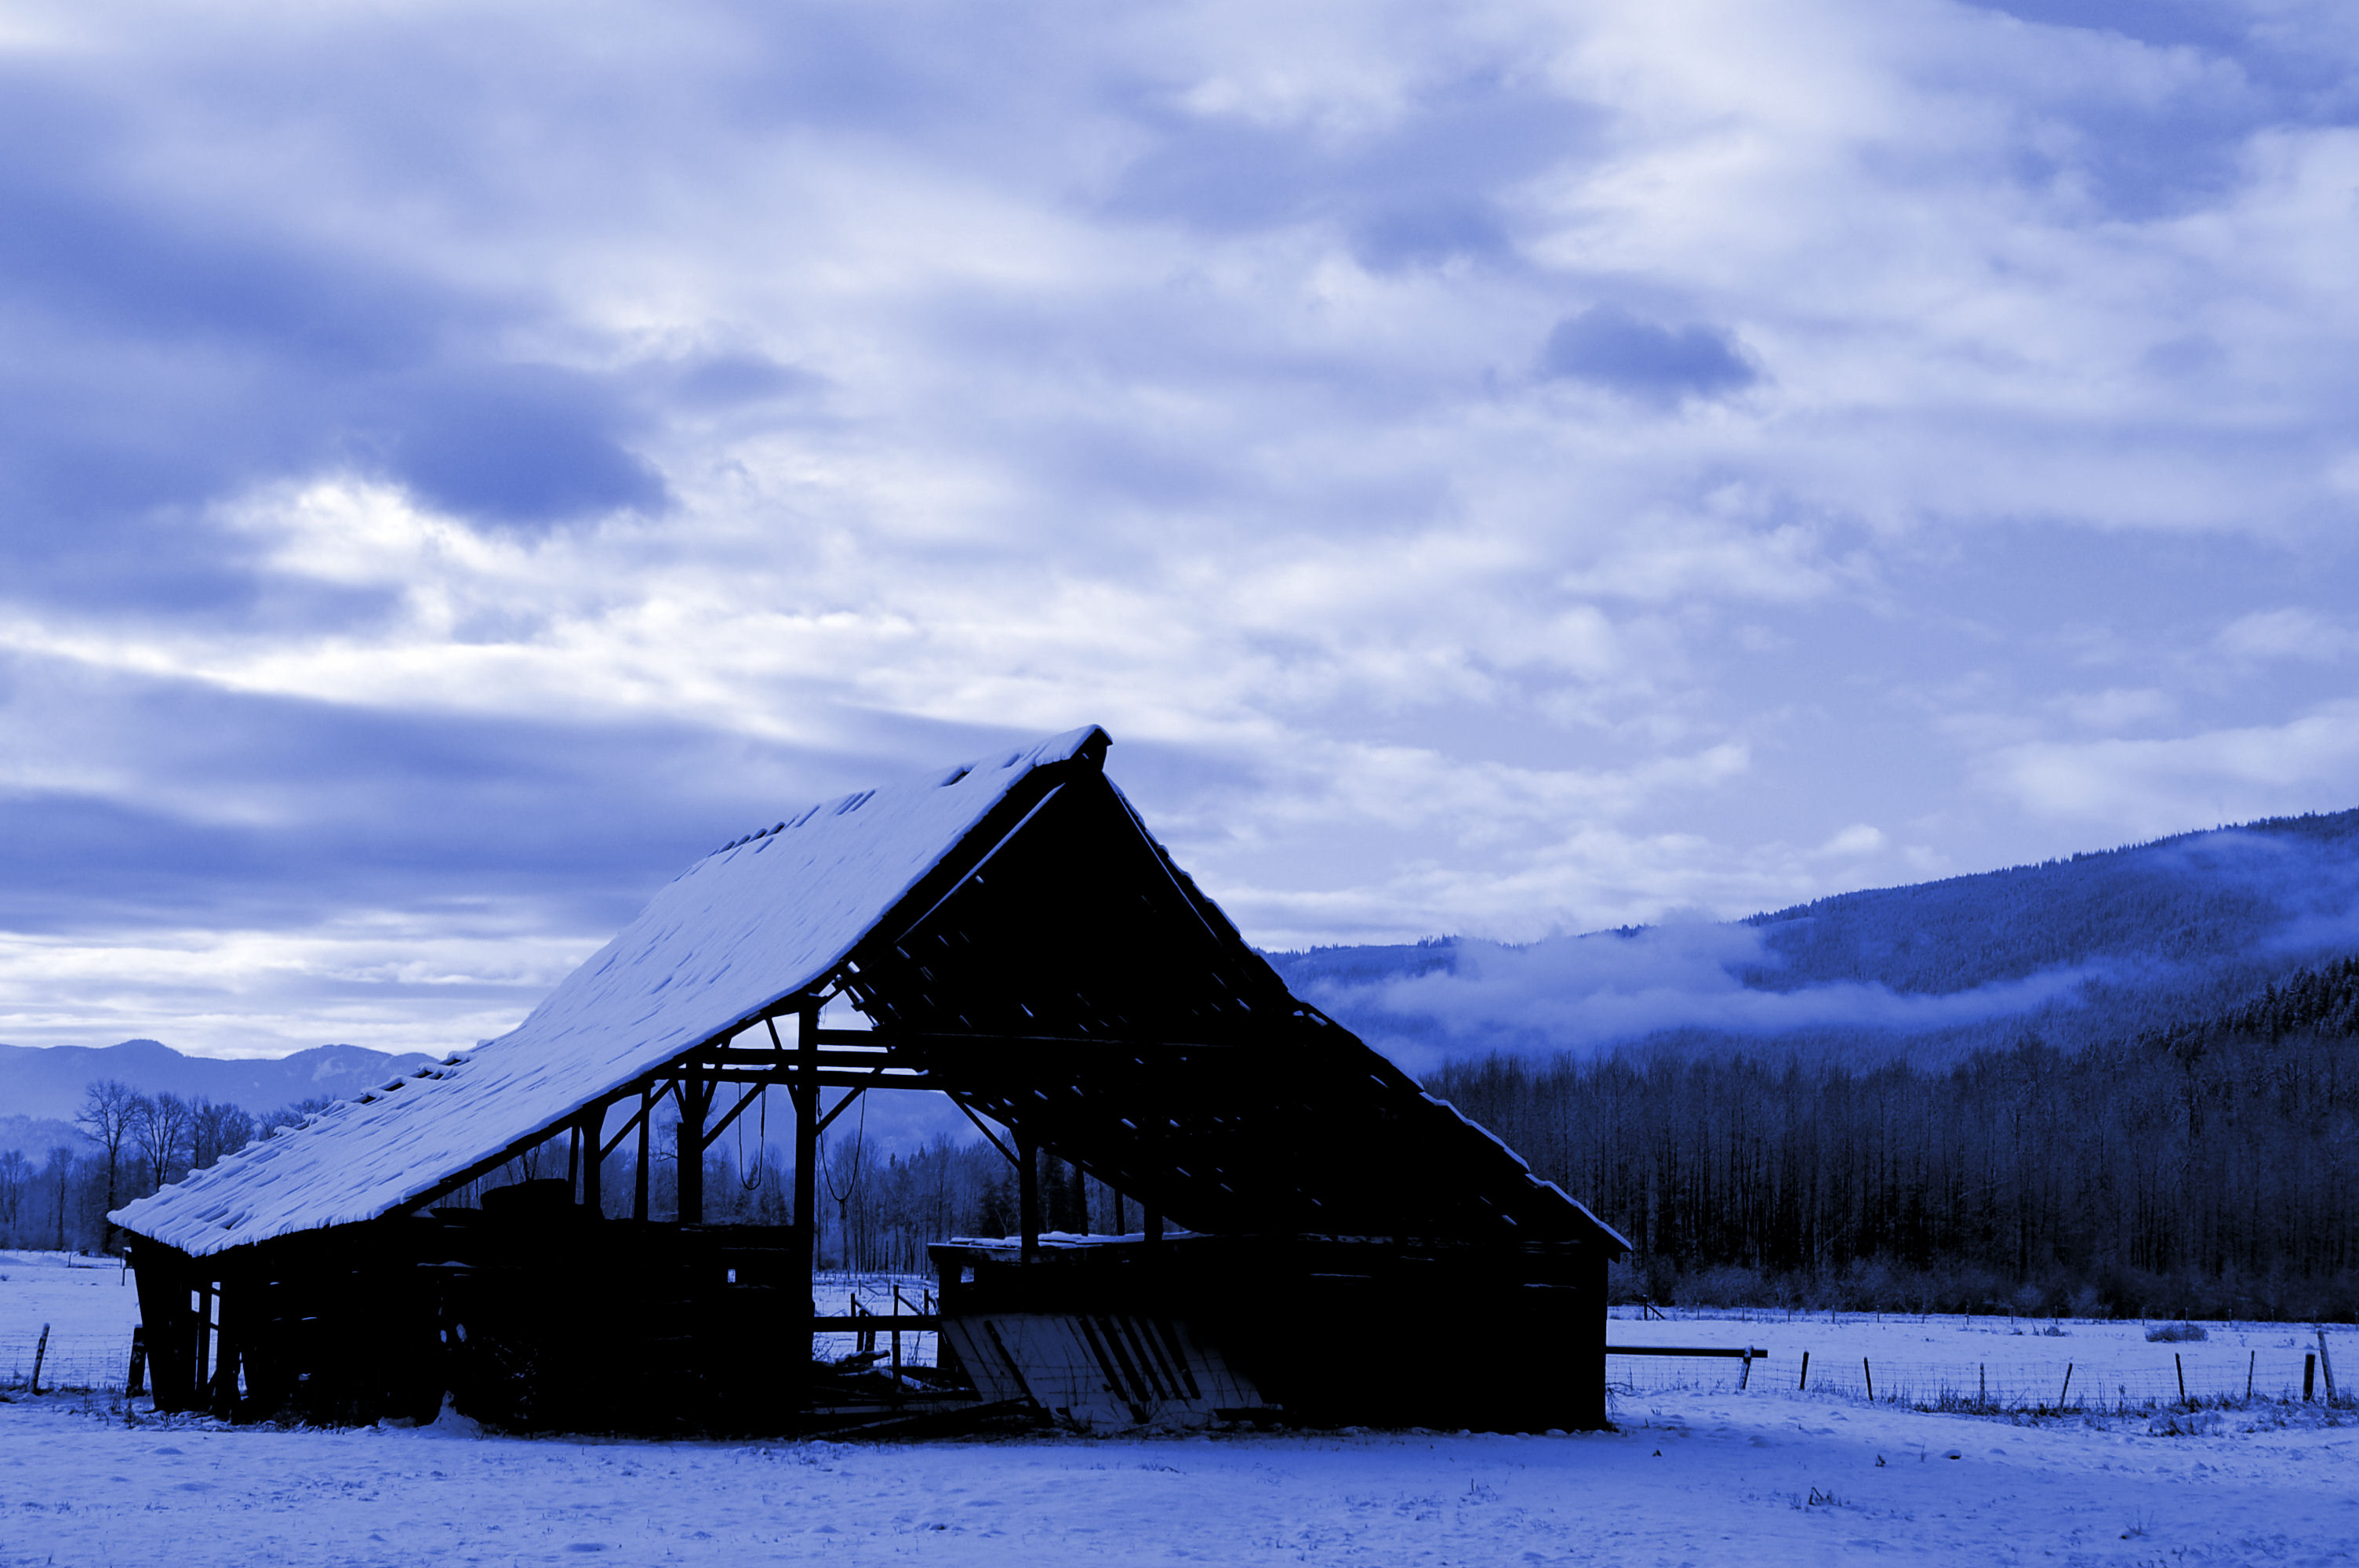 Procter barn, Abandoned, Barn, Blue, Bspo07, HQ Photo